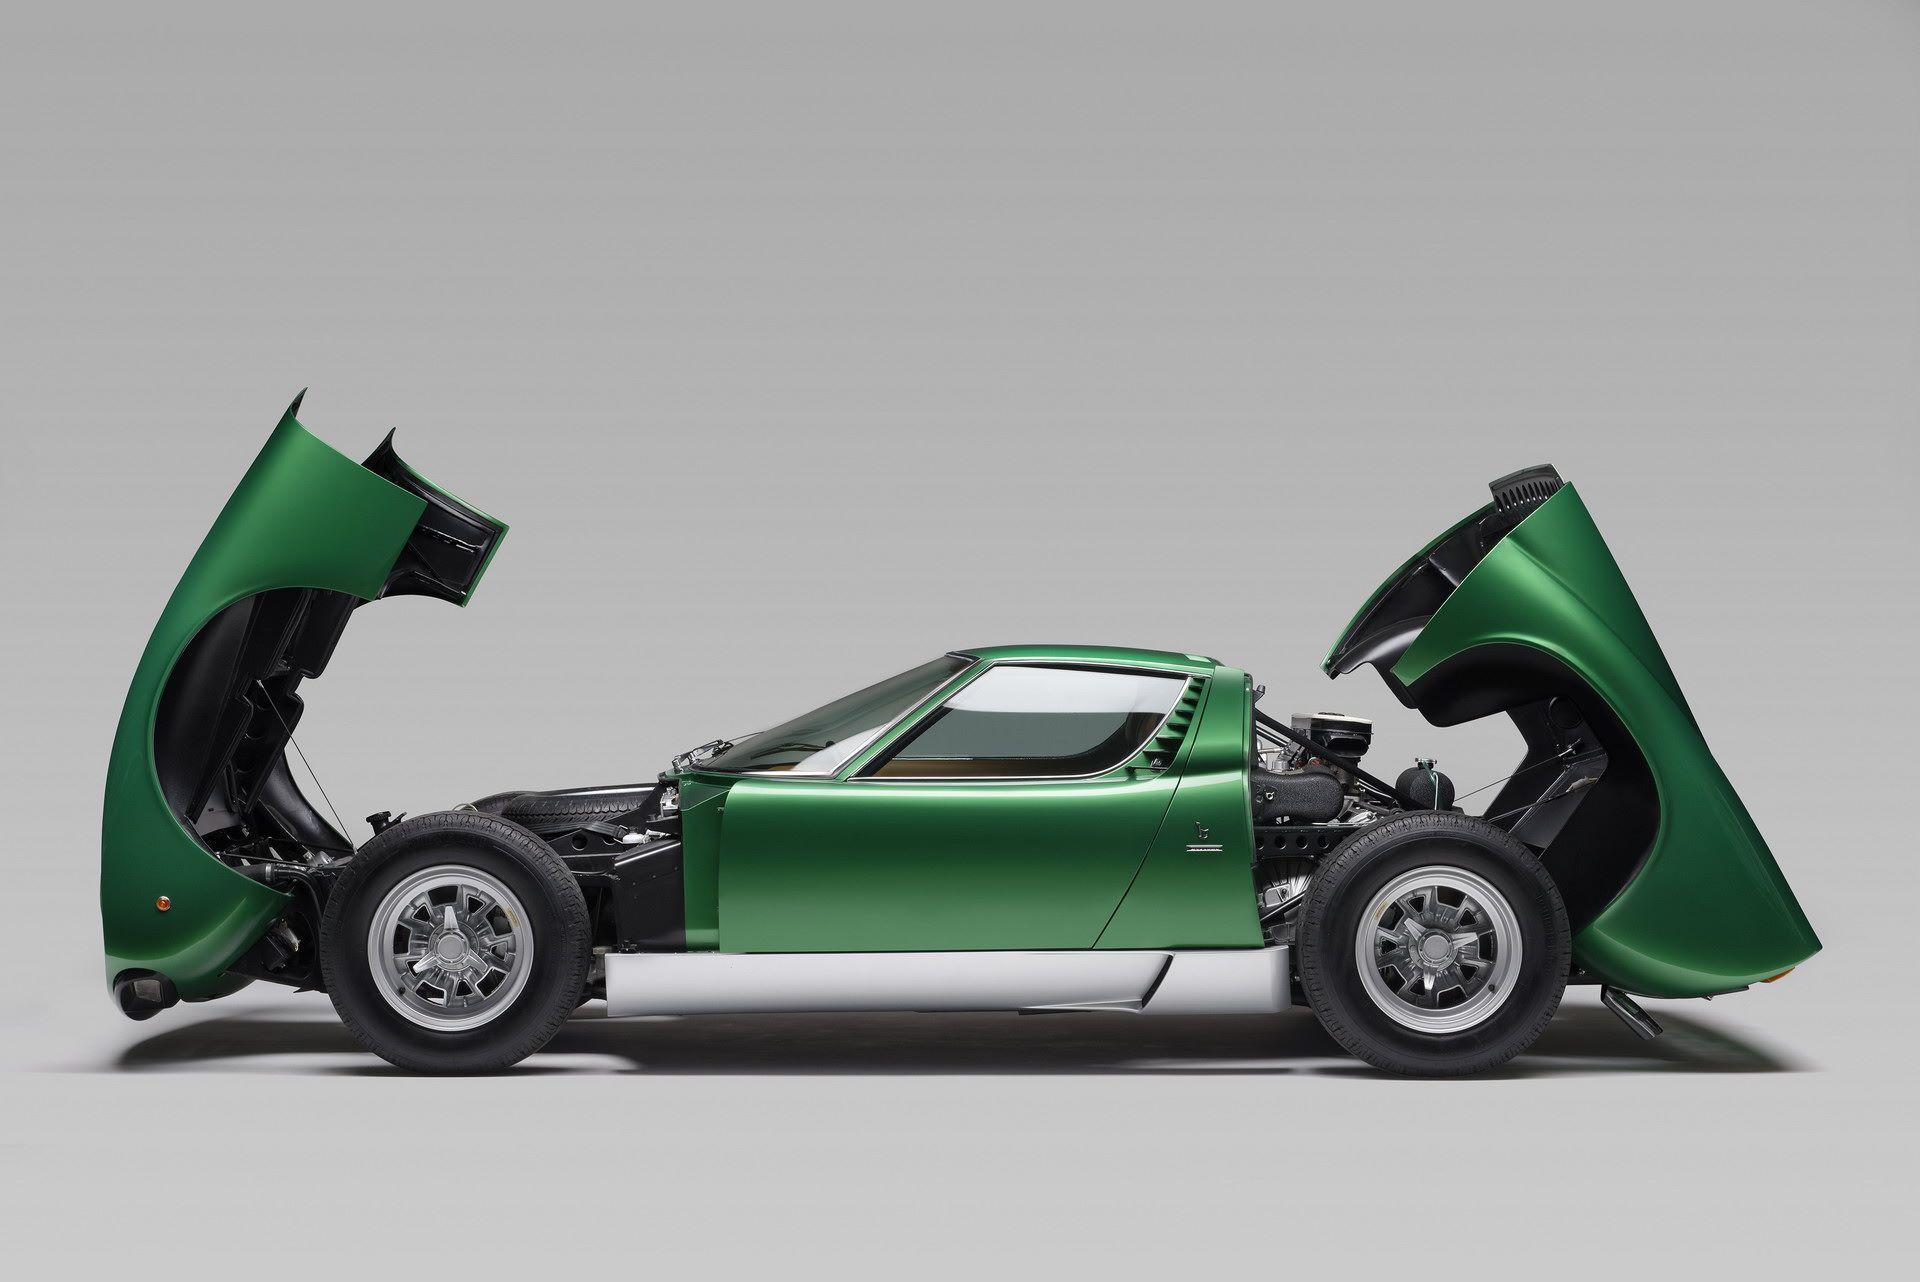 Lamborghini-Miura-SV-turns-50-10